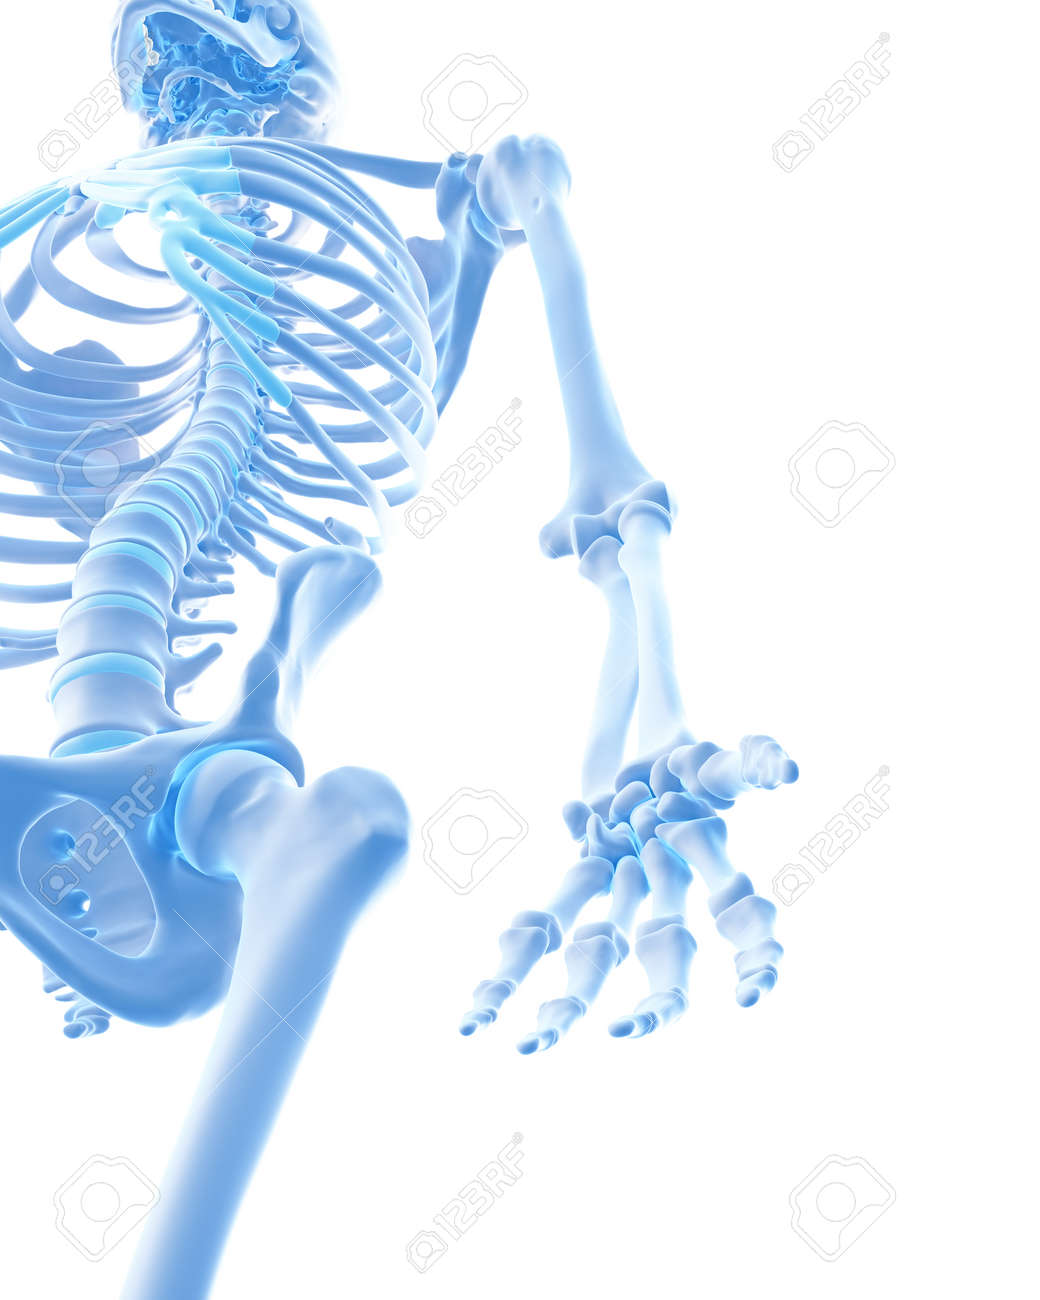 Charmant Handknochenanatomie X Ray Fotos - Menschliche Anatomie ...